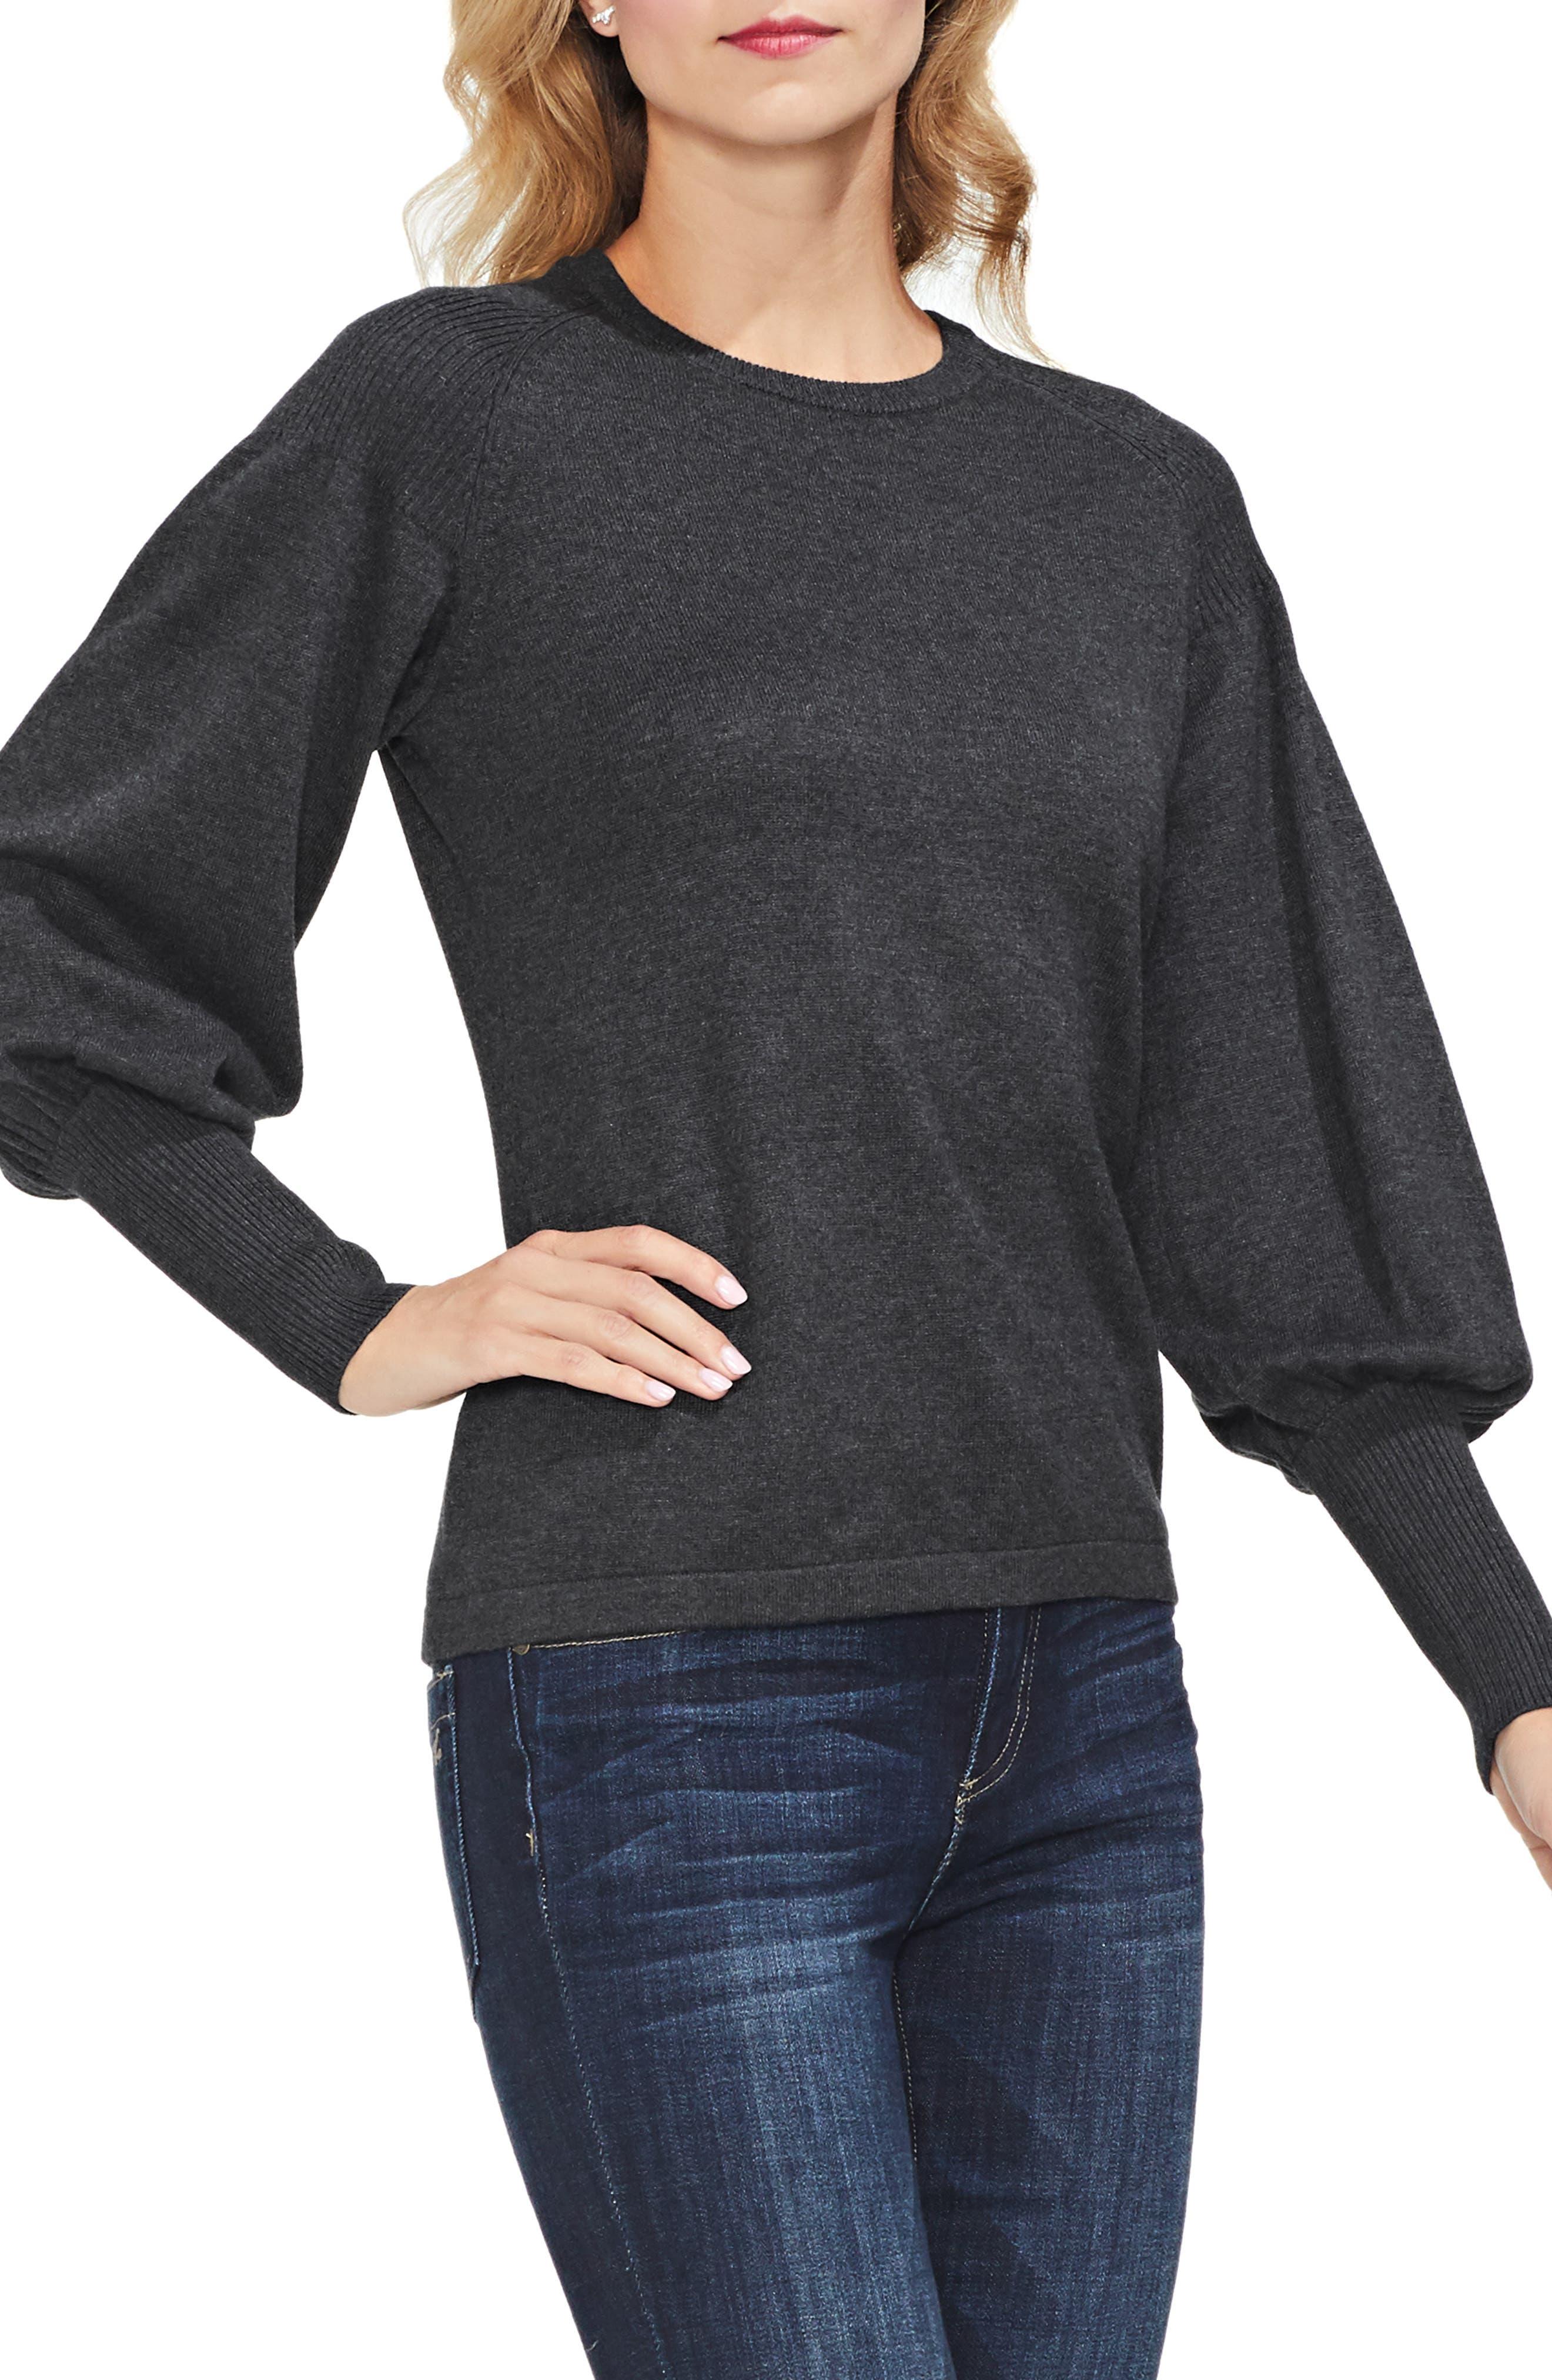 Blouson Sleeve Sweater,                             Main thumbnail 1, color,                             MED HEATHER GREY